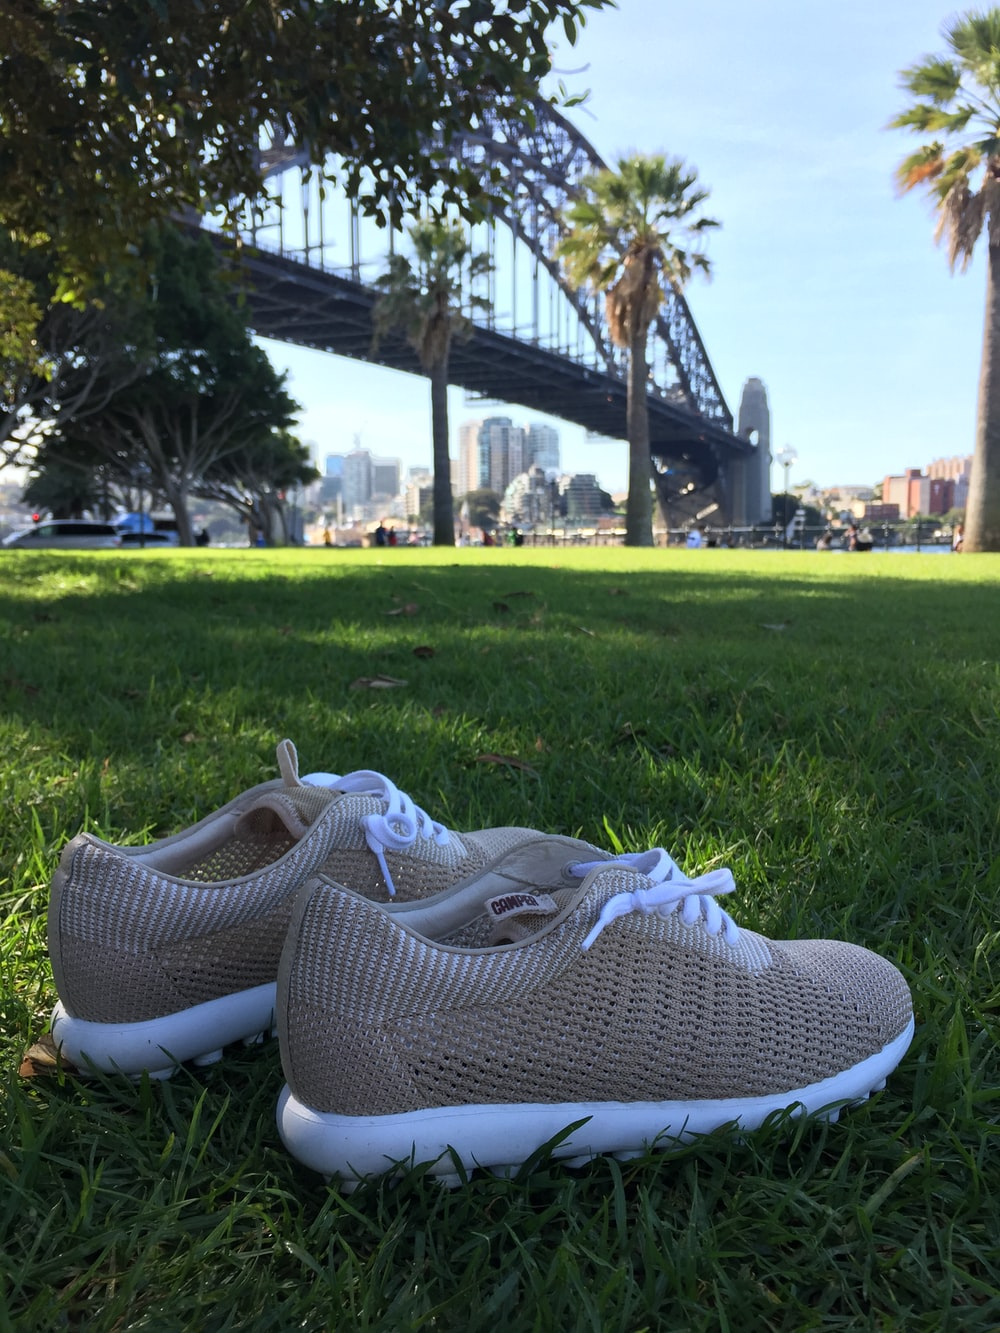 brown low-top shoes on grass near bridge